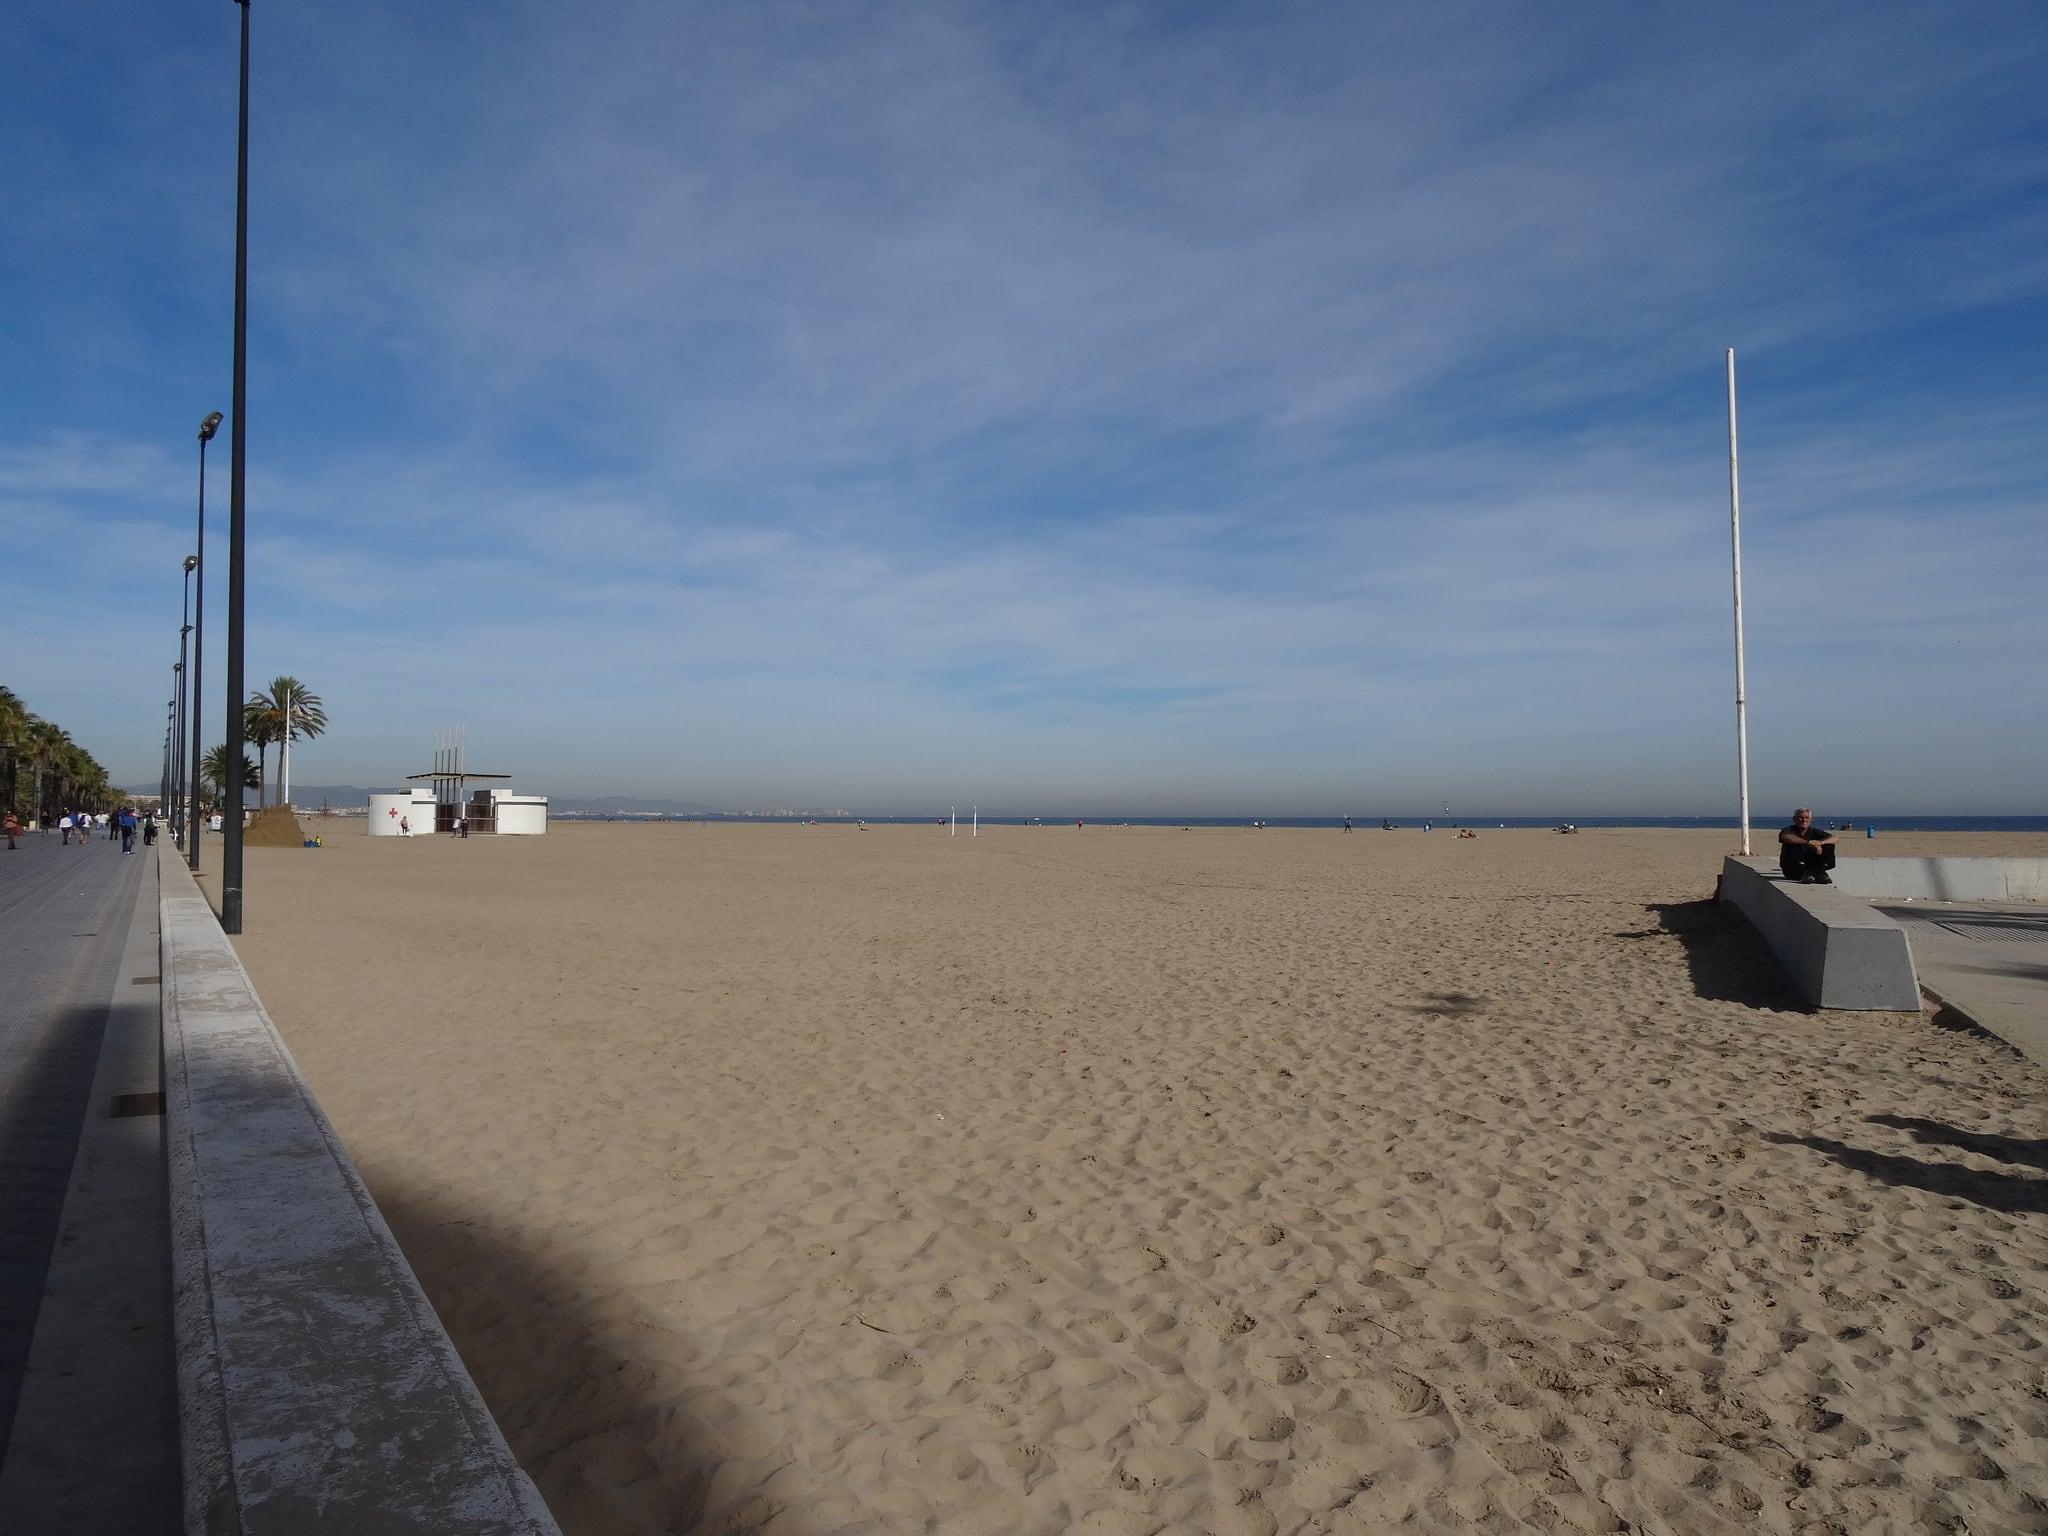 Attēls no Platja del Cabanyal - Les Arenes pie Valencia. 2015 herfst spain espana españa spanje valencia beach playa strand seaside sea zee autumn